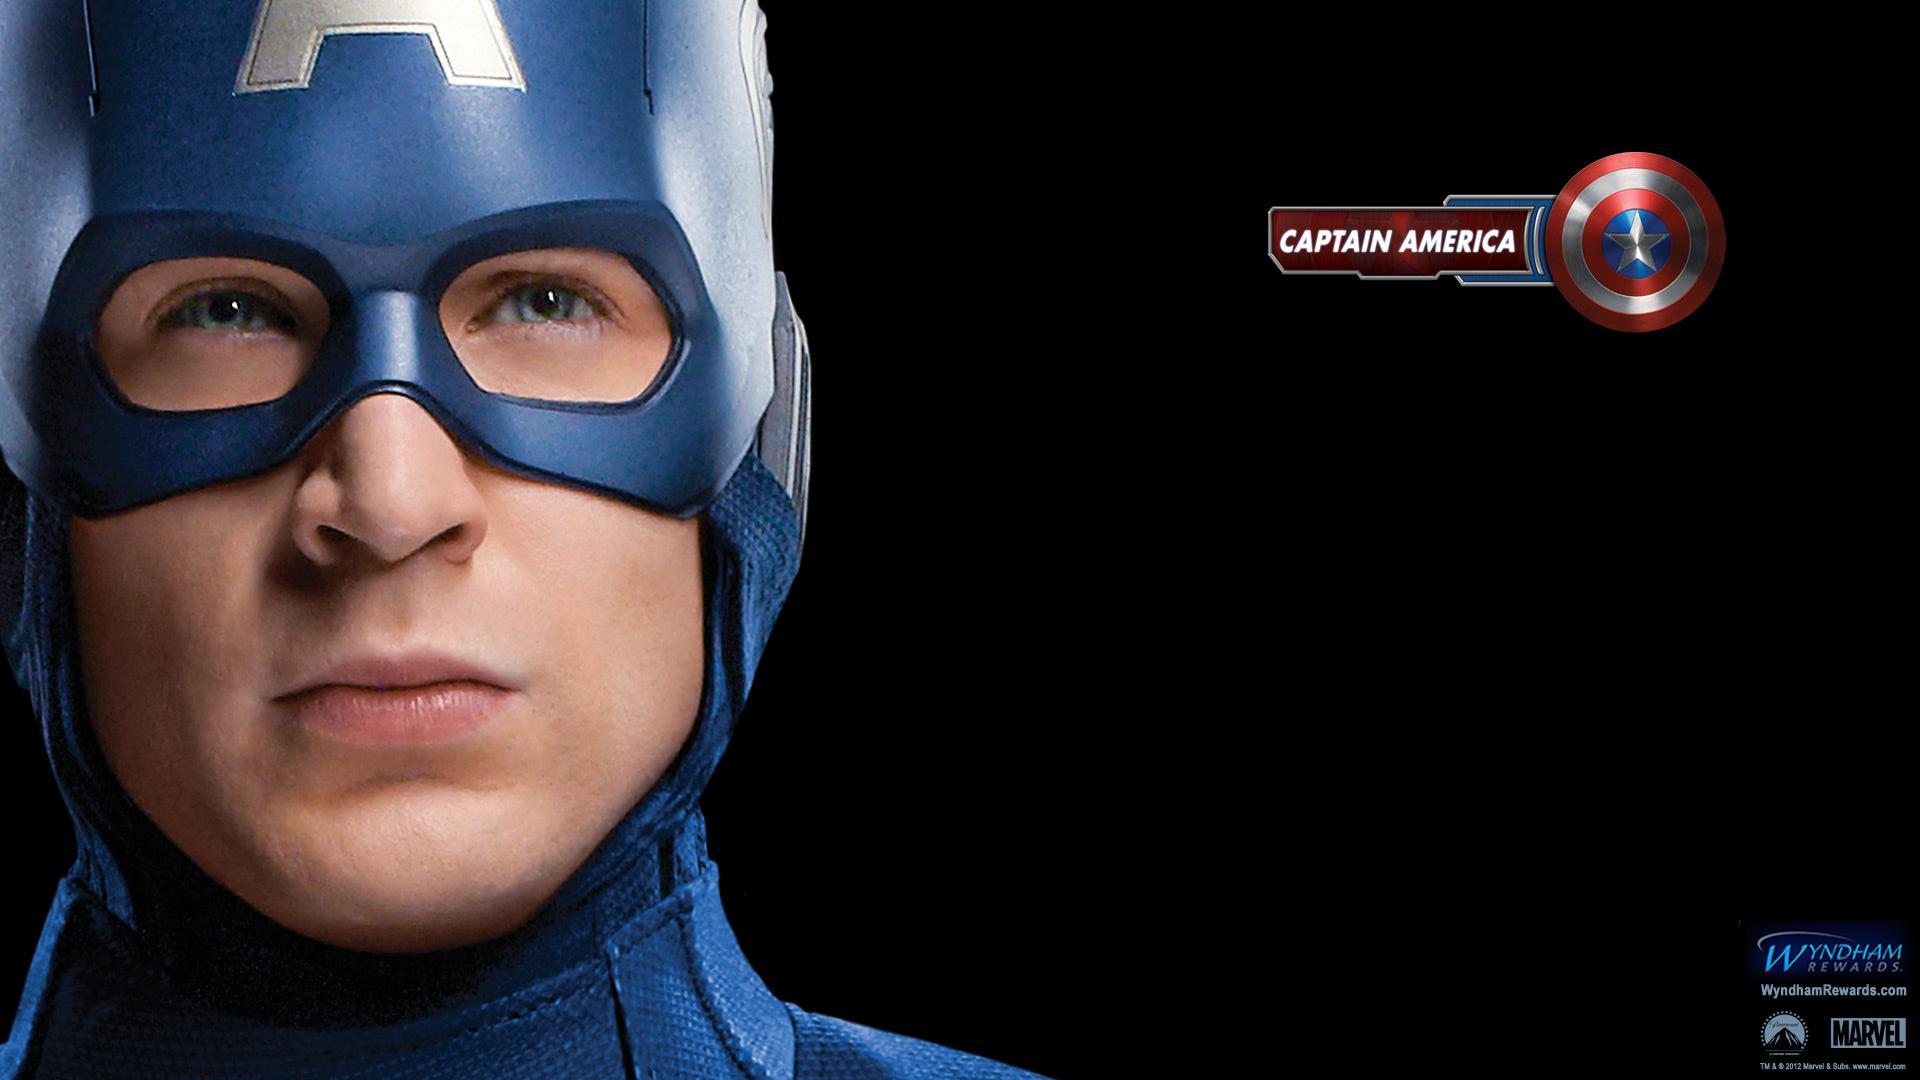 Captain-America-is-the-dullest-Avenger-Description-from-thefocusedfilmographer-com-I-searche-wallpaper-wp3801704